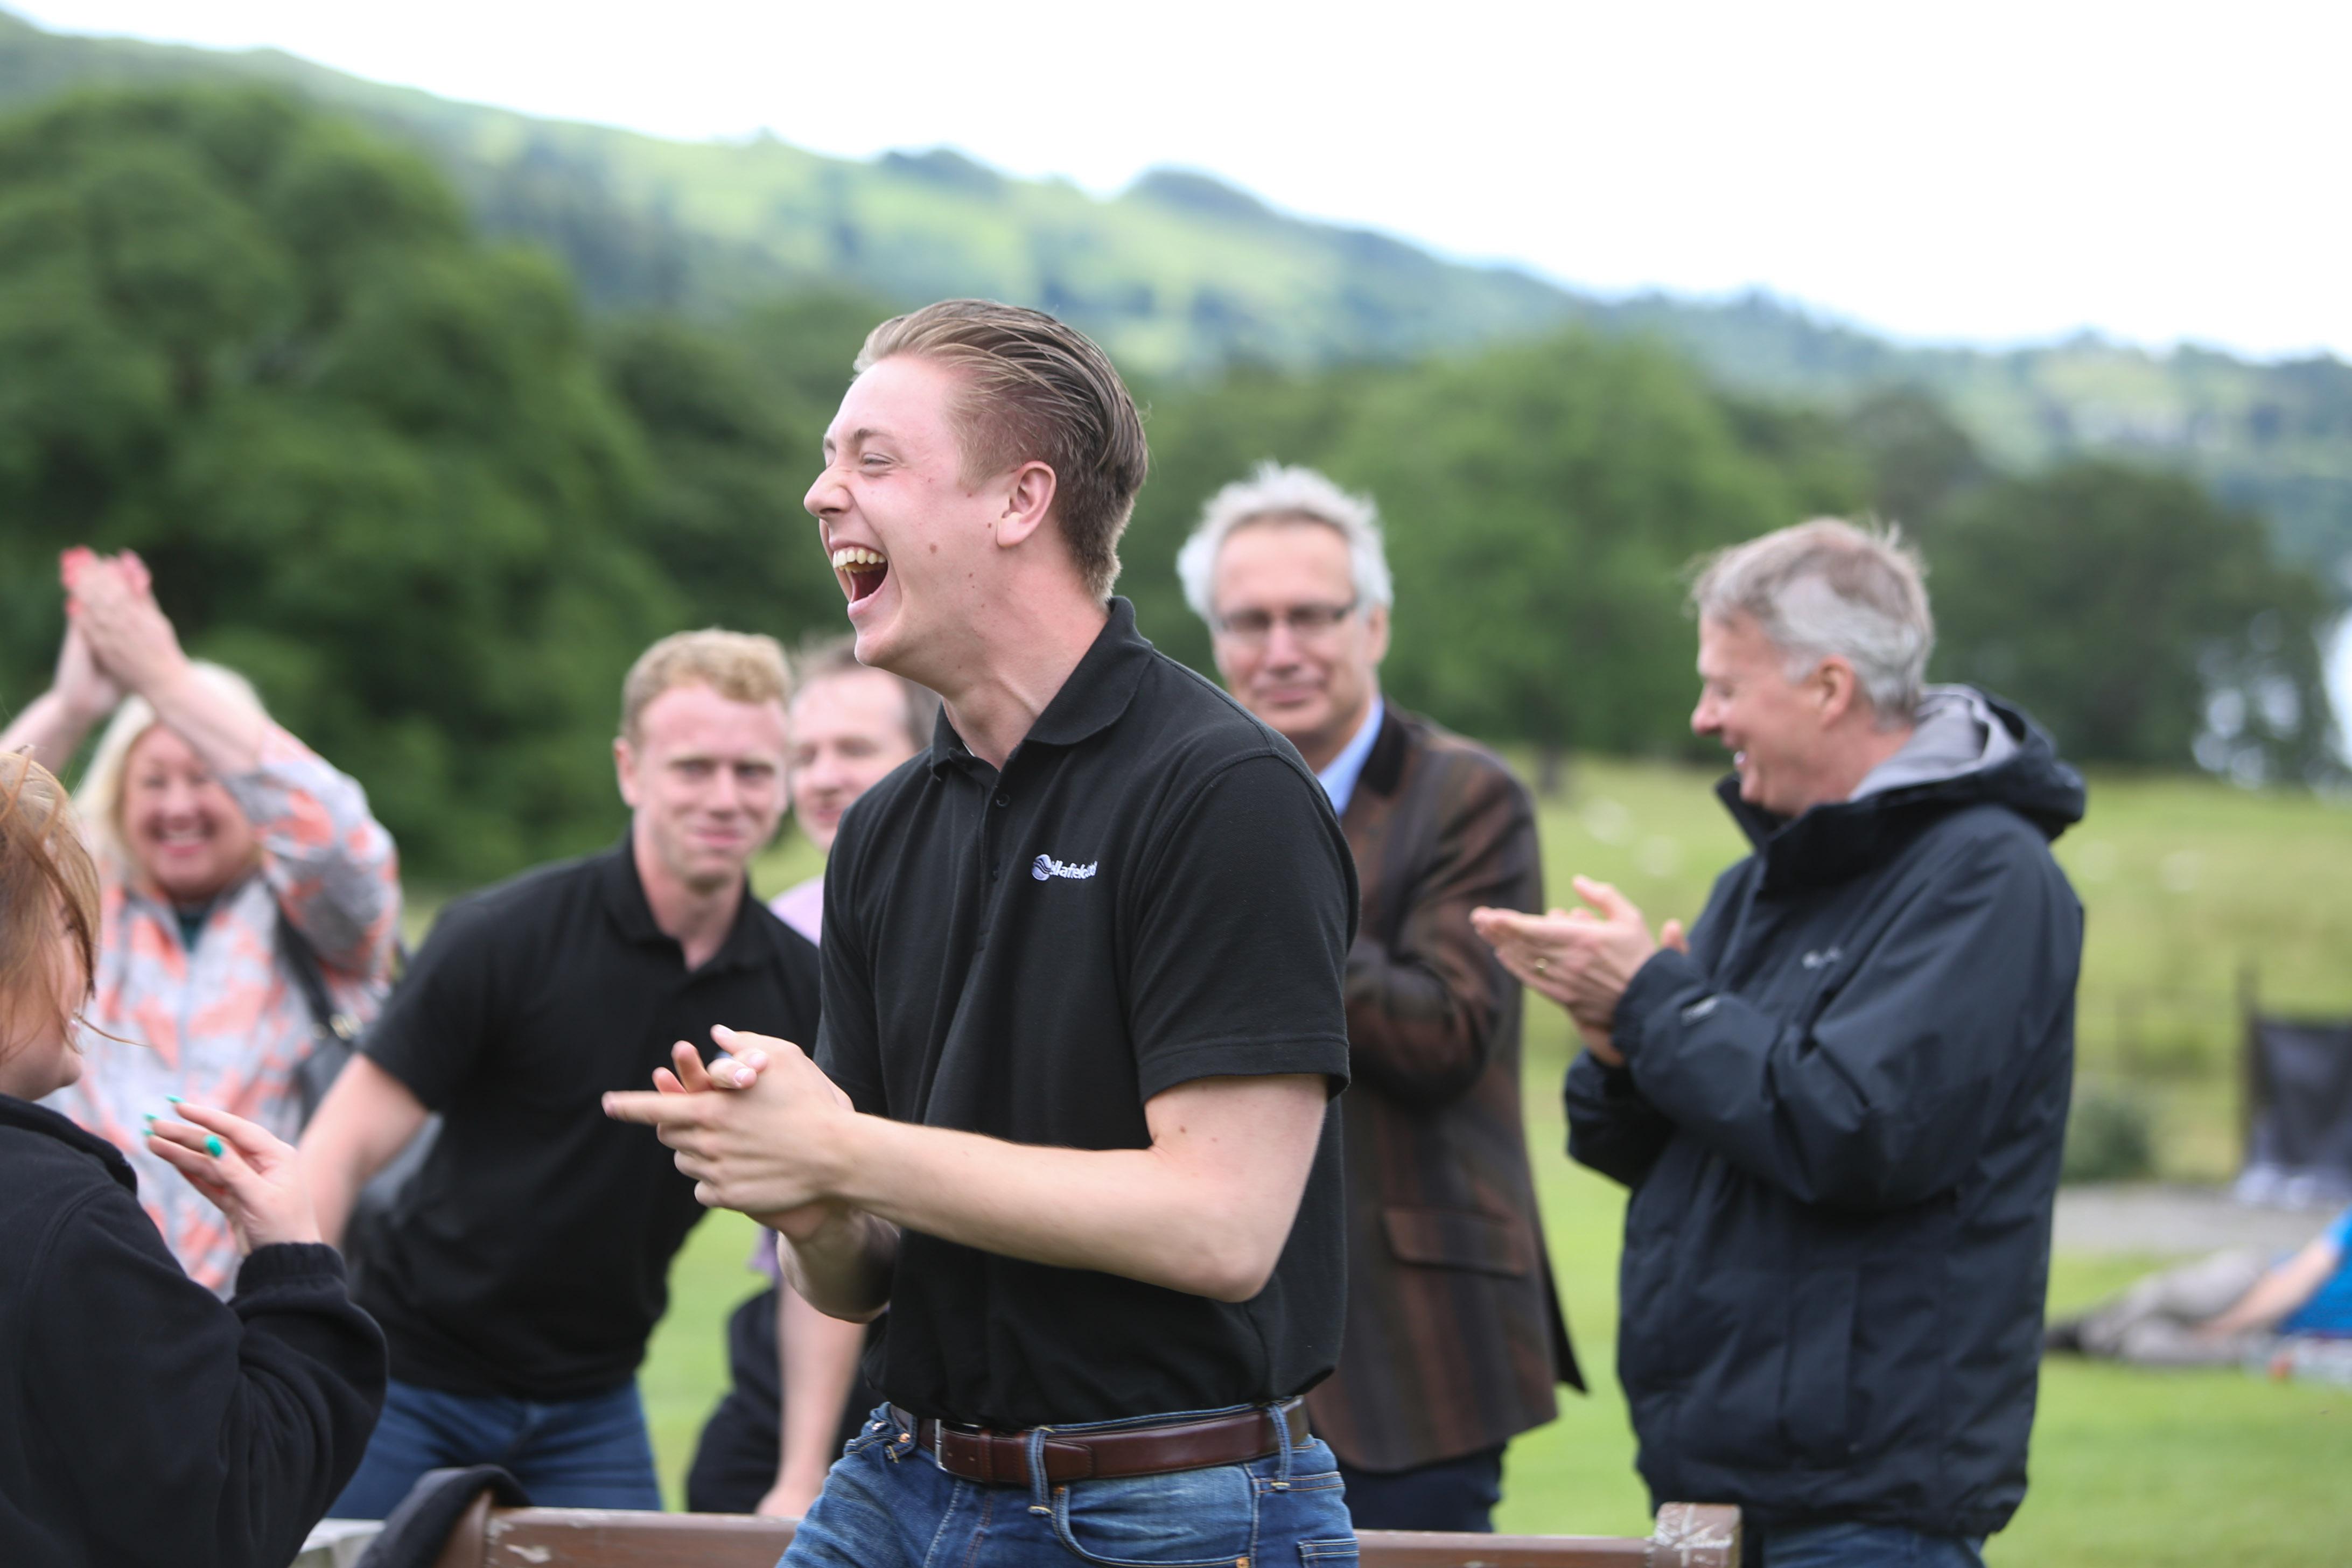 A Sellafield team member celebrates victory